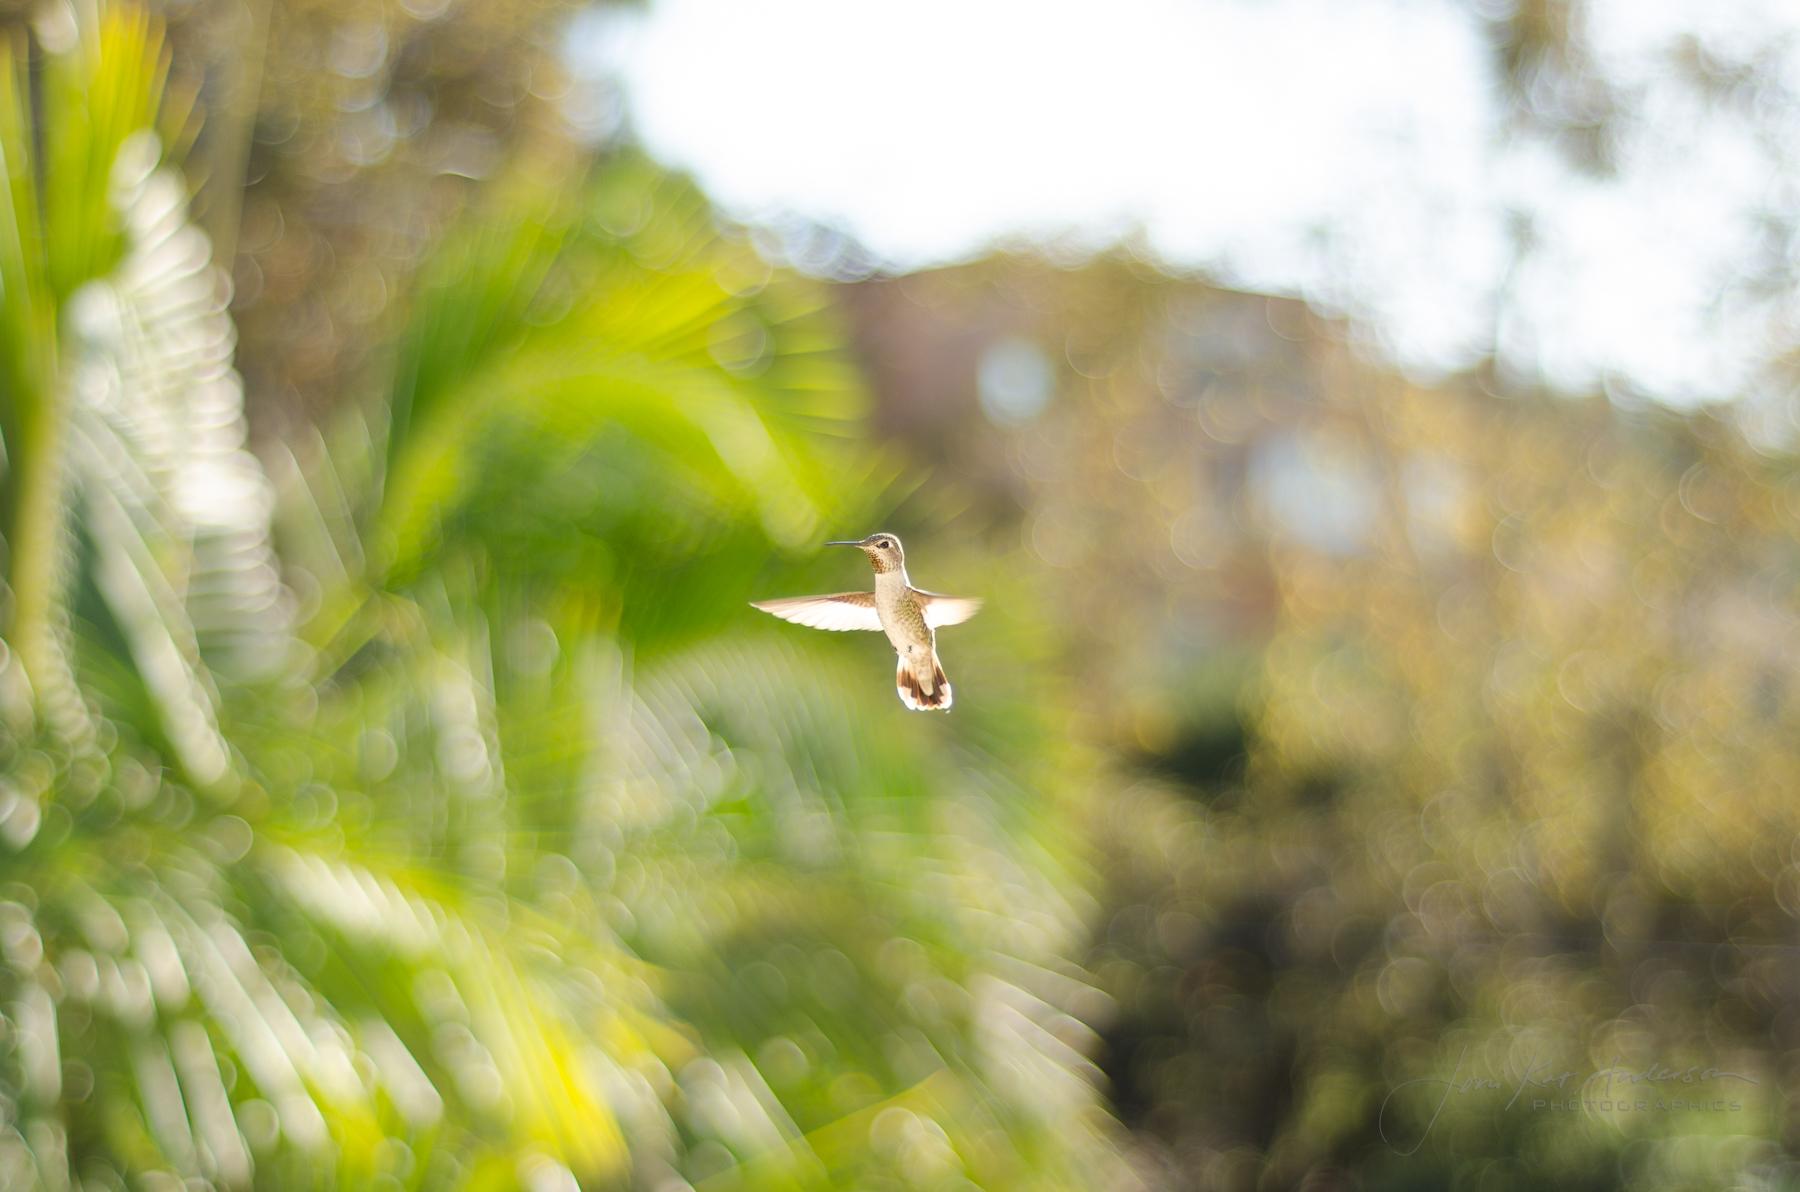 hummingbirds_dsc4320